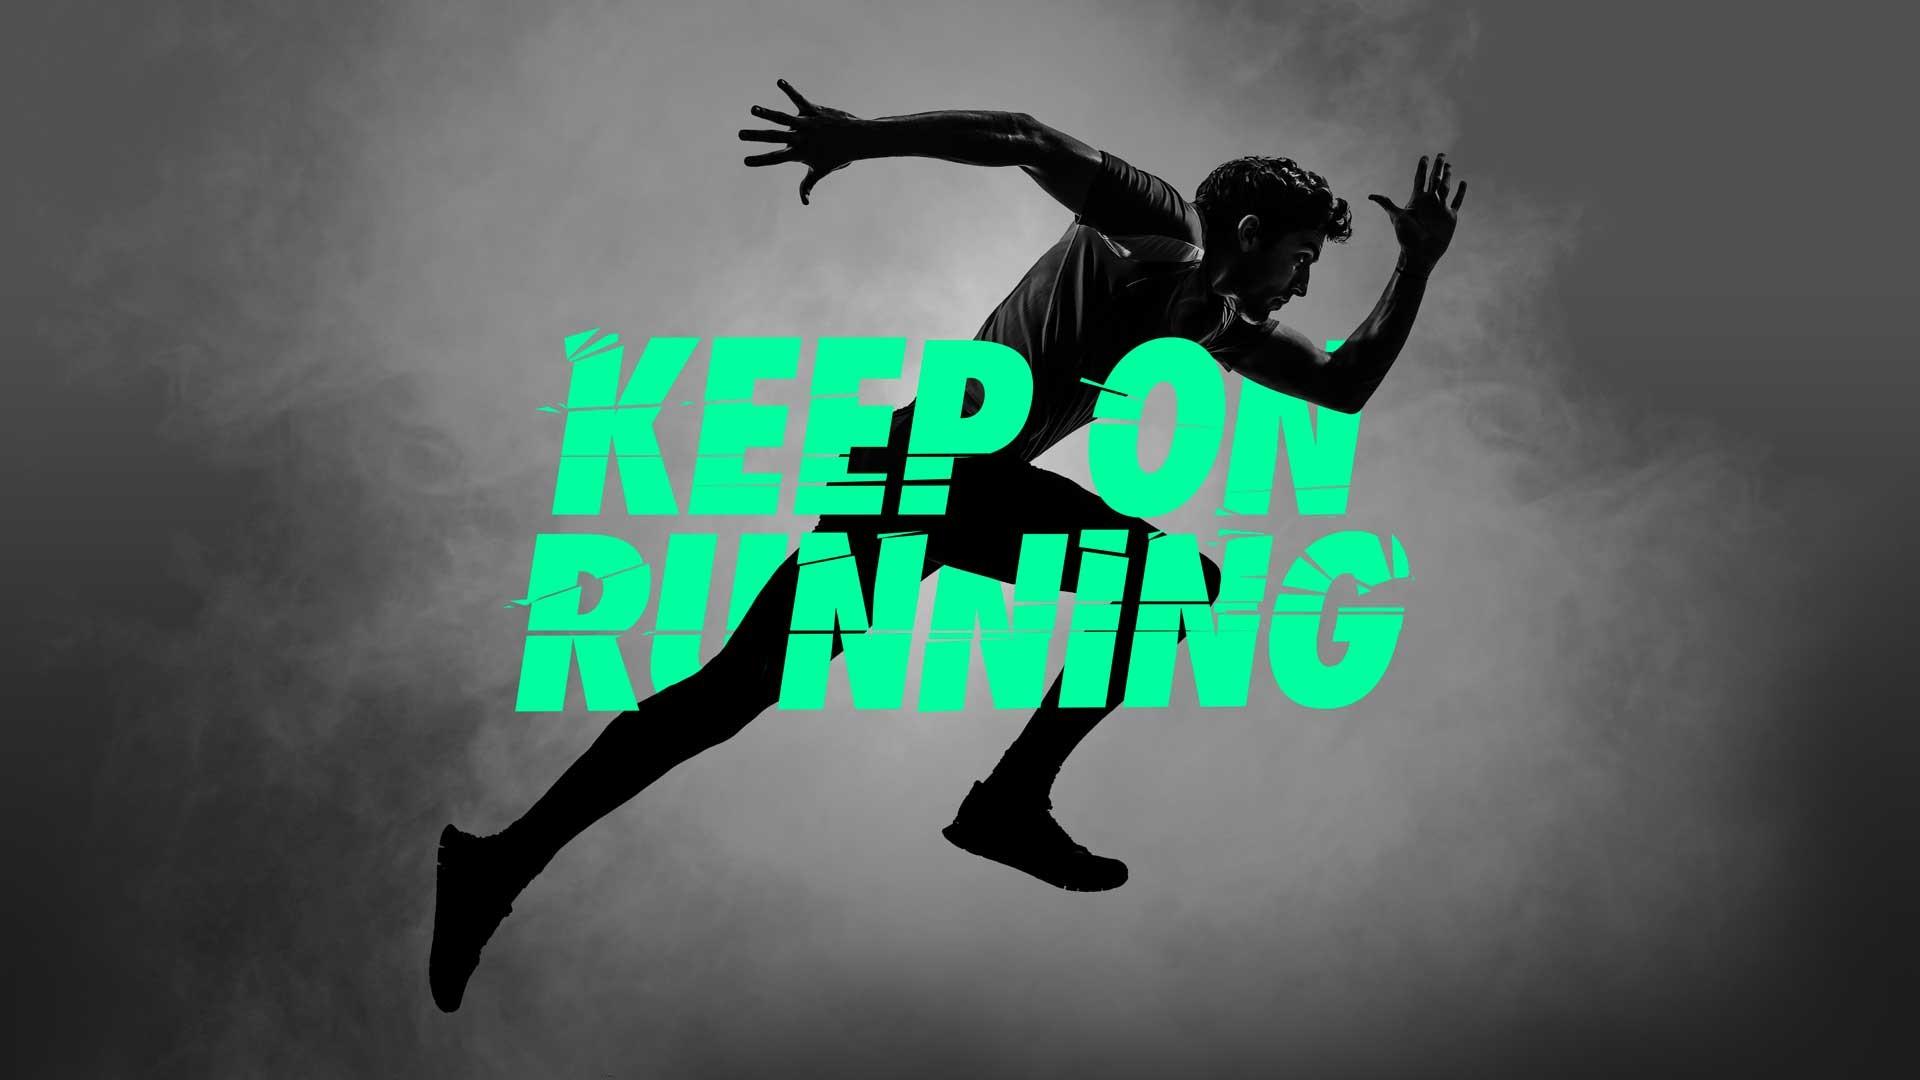 Nike Running Wallpaper 62 images 1920x1080